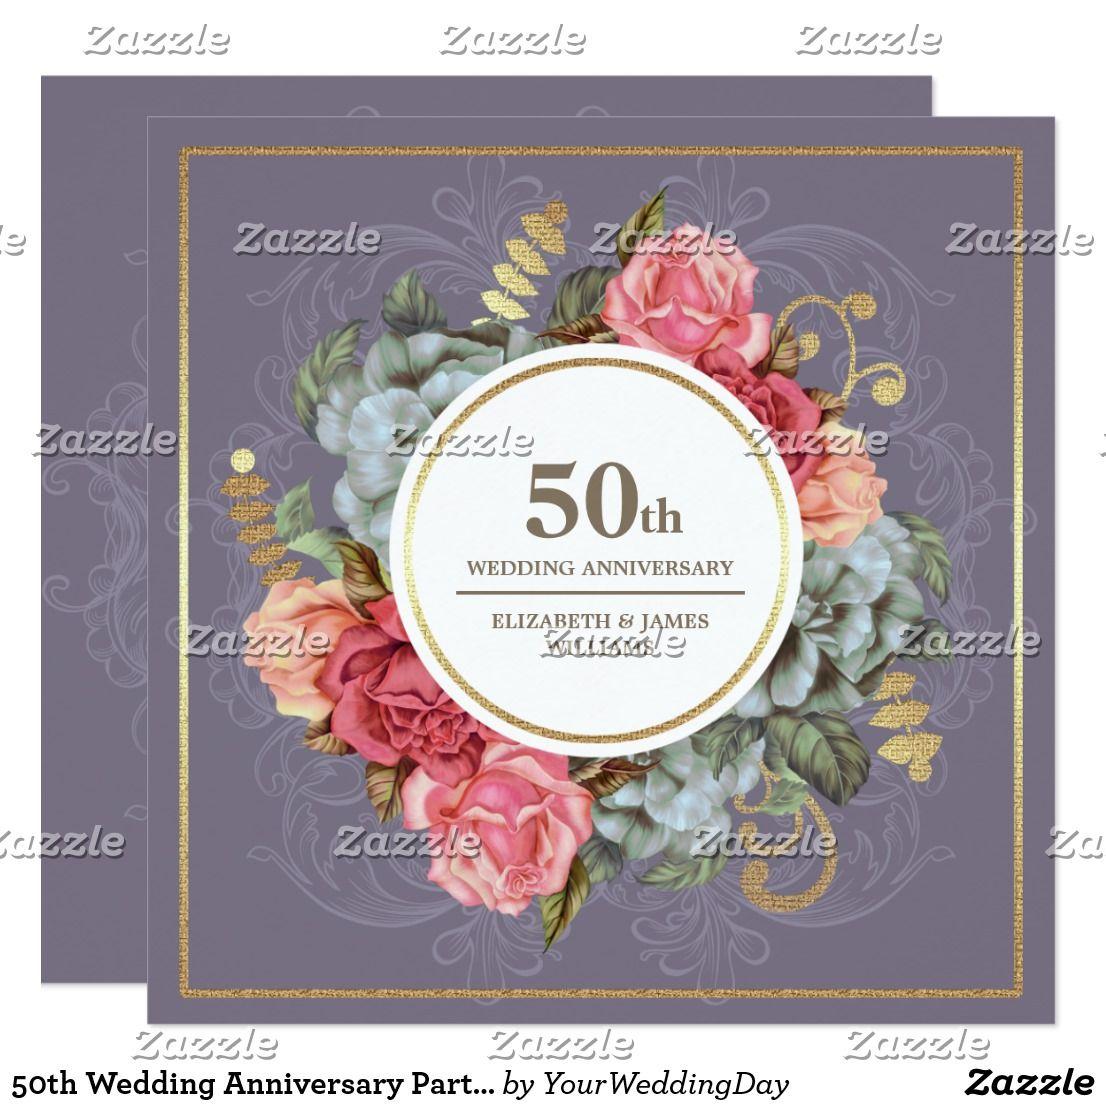 50th Wedding Anniversary Party Invitations Zazzle Com 50th Wedding Anniversary Party 60th Wedding Anniversary Party Wedding Anniversary Party